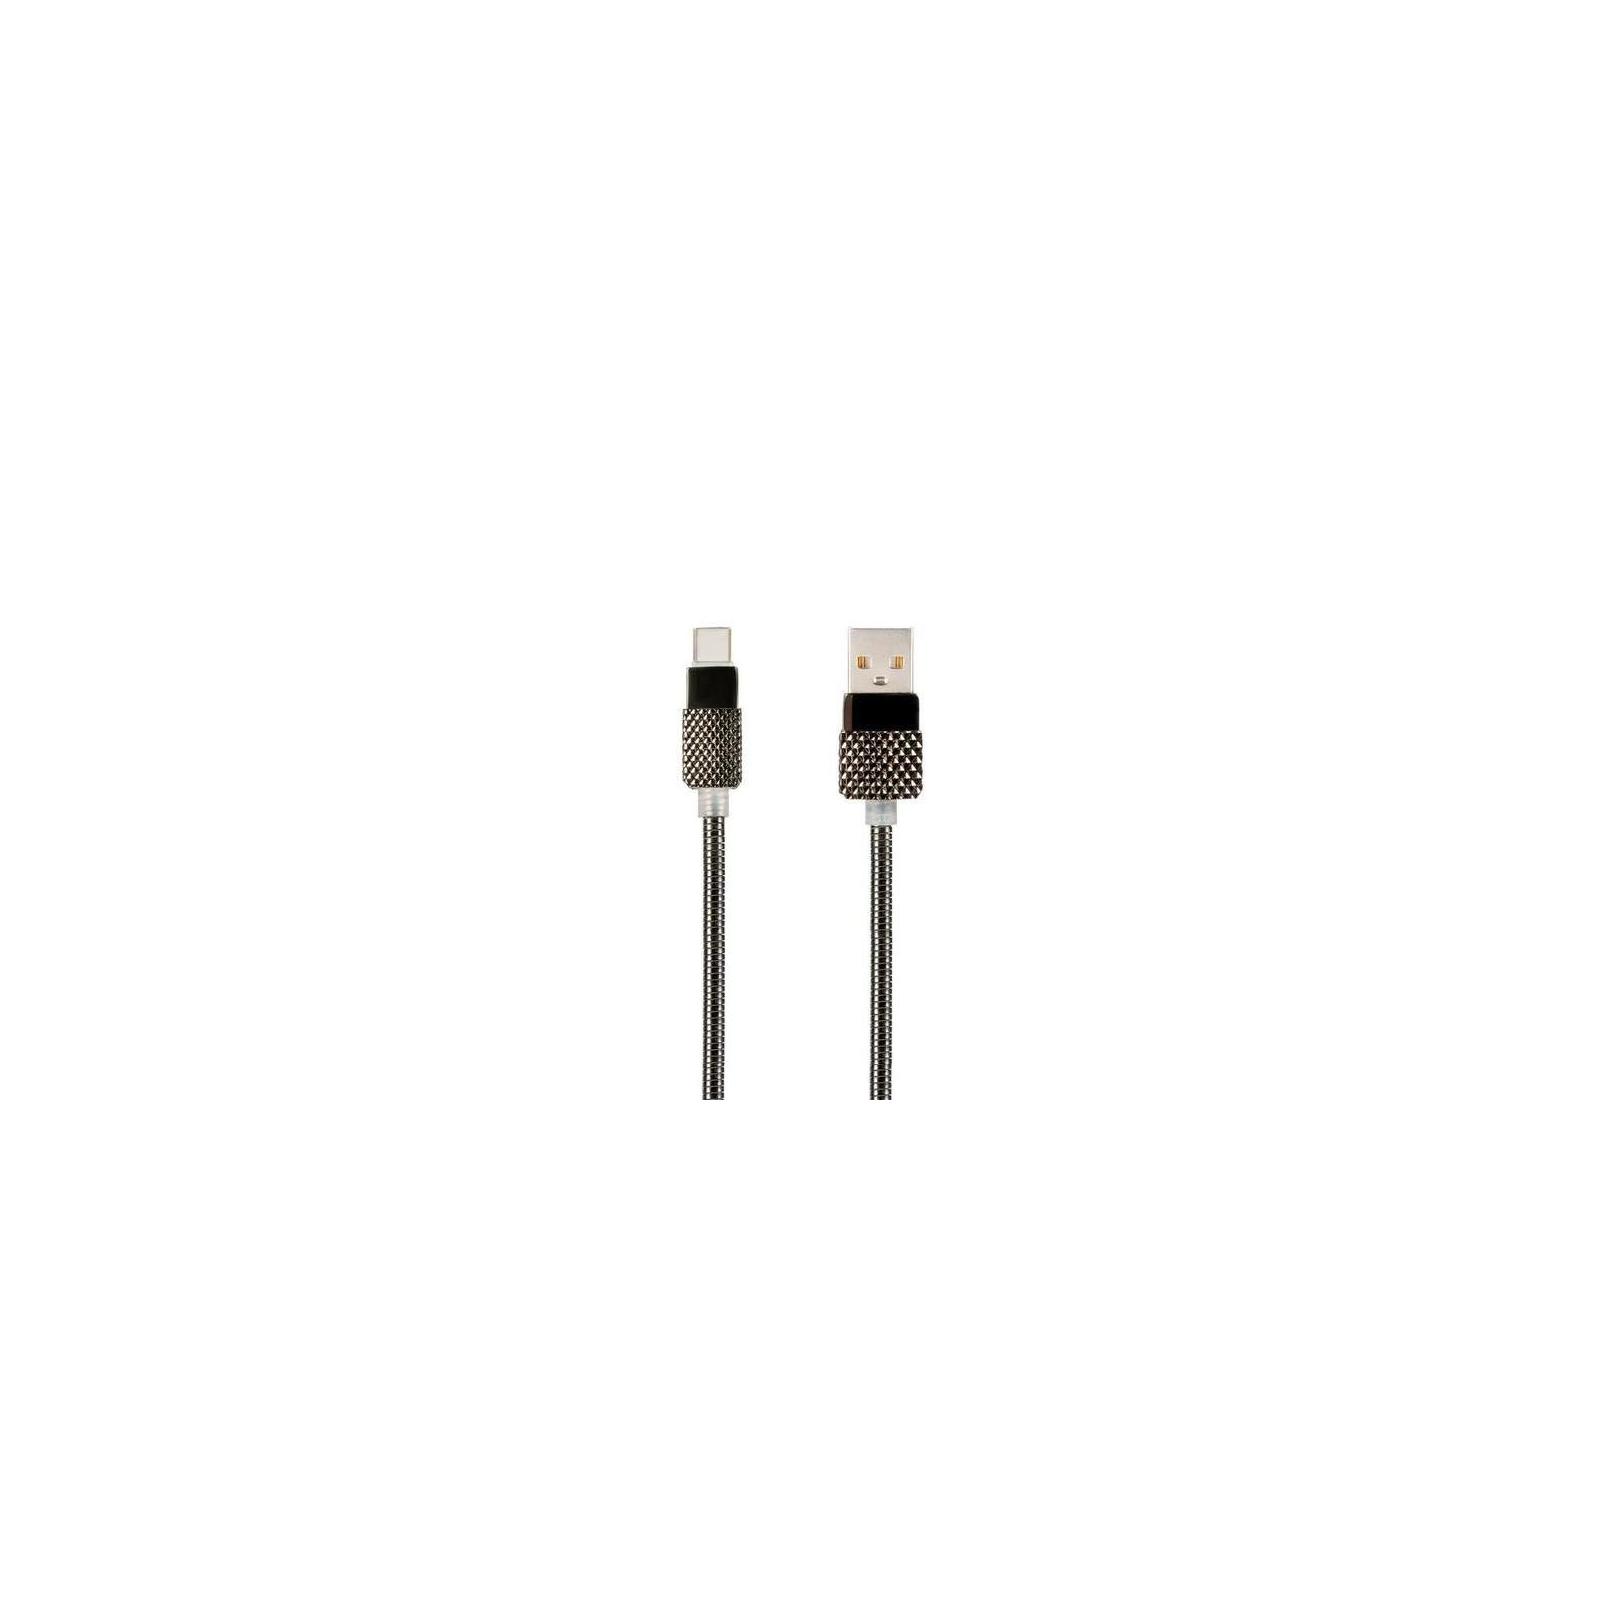 Дата кабель USB 2.0 AM to Type-C Pro Royal 2A Black Gelius (65124)